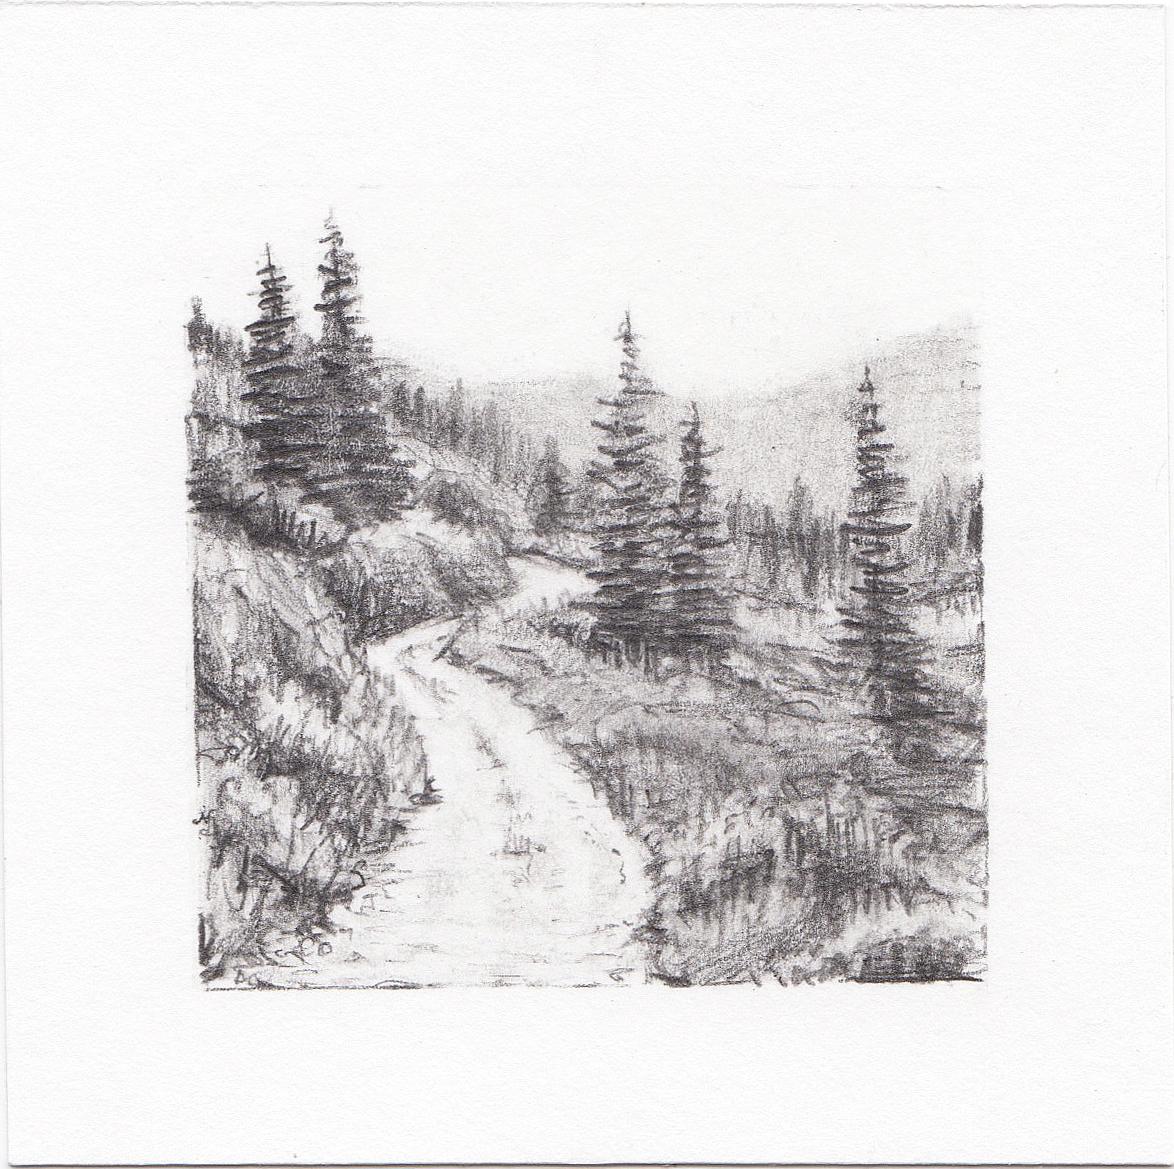 #11 Mill D South Fork, Big Cottonwood Canyon, Utah | 3x3 | graphite